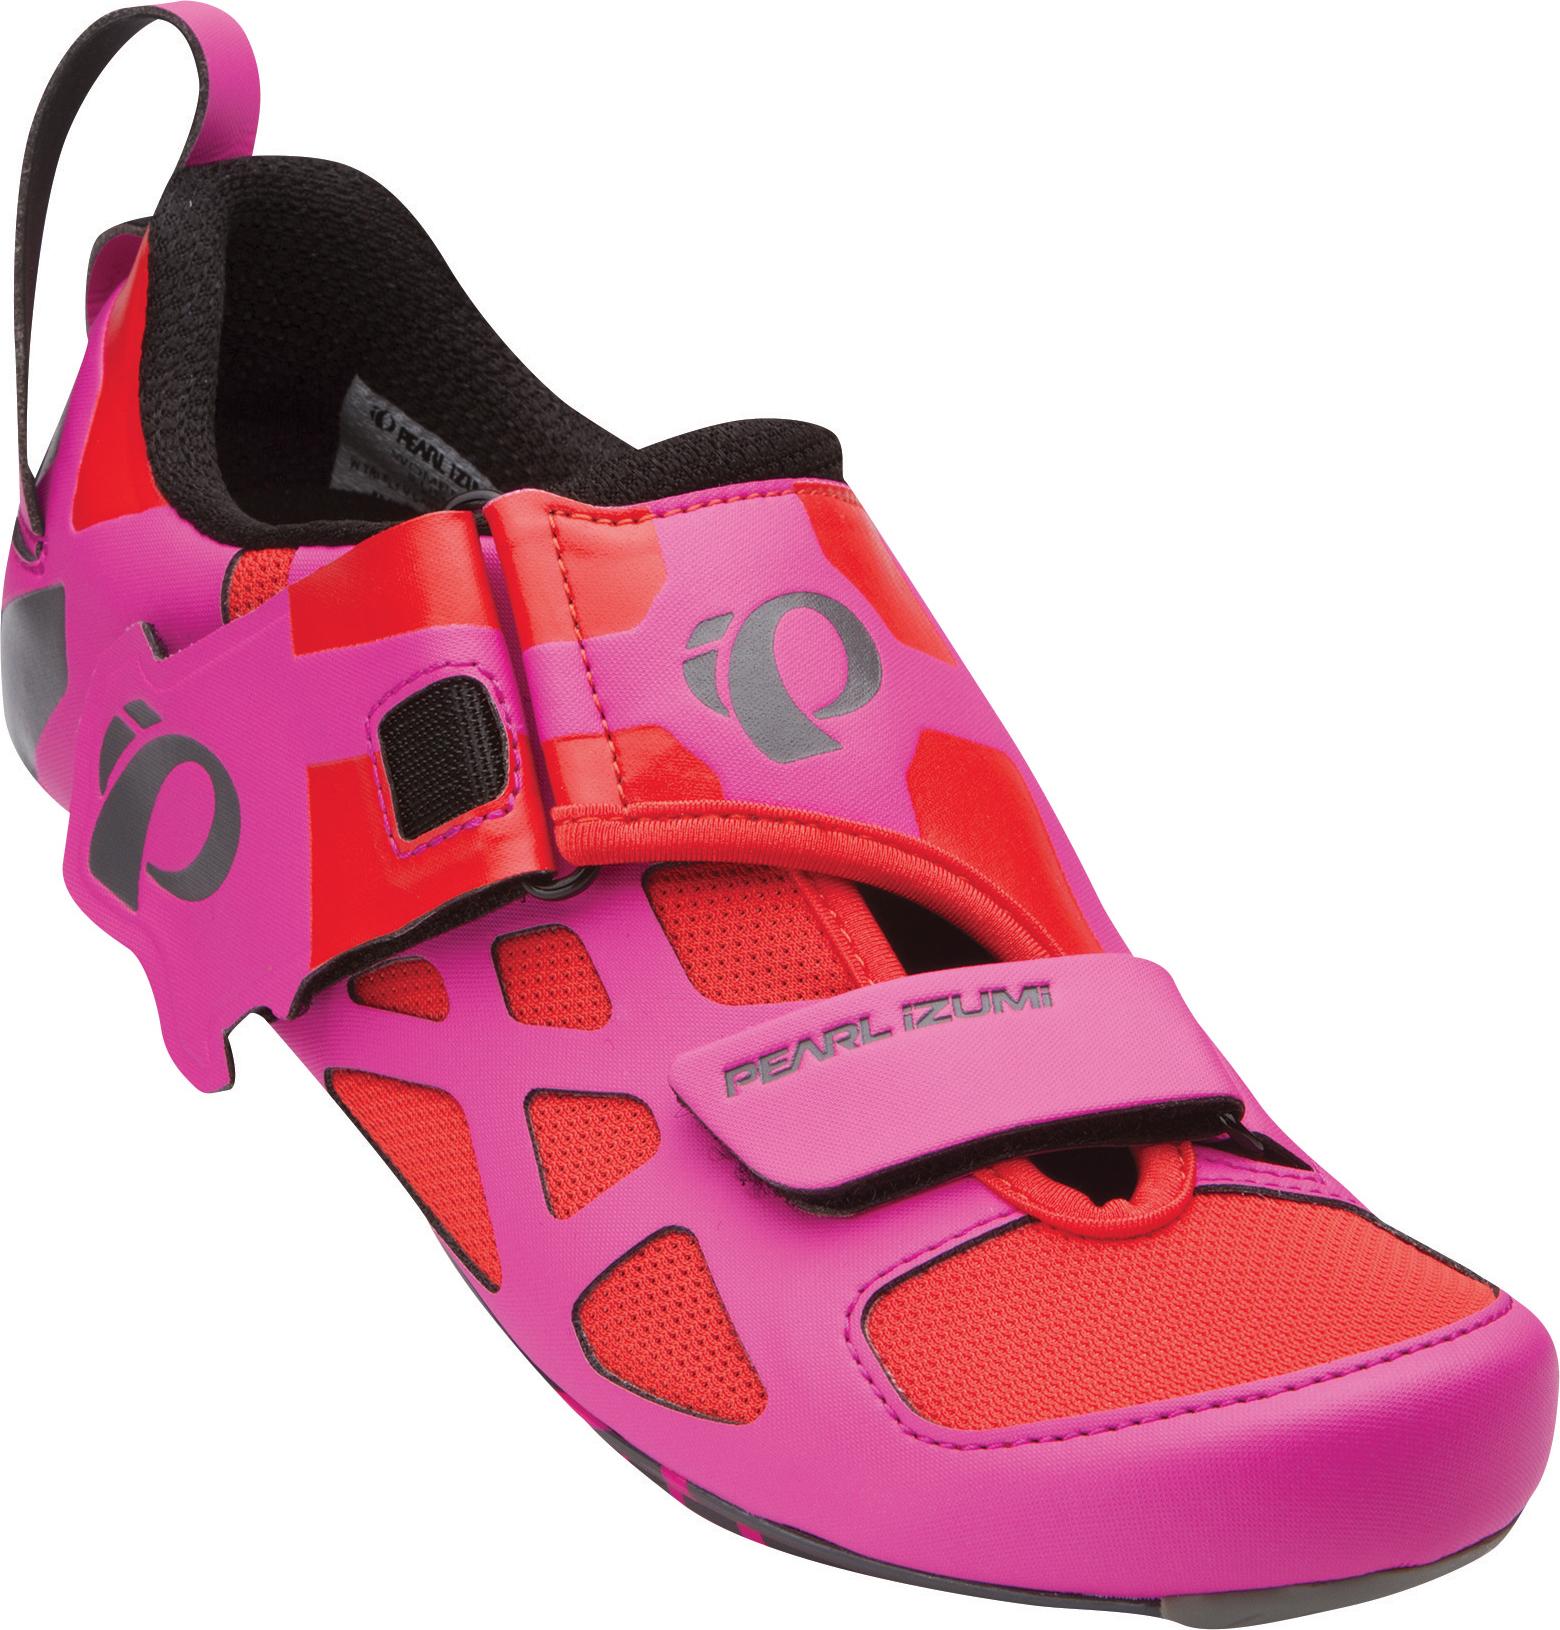 Schuhe Carbon Triathlon Pinkschwarz V Tri Damen Pearl Fly Izumi ZuPOkiX